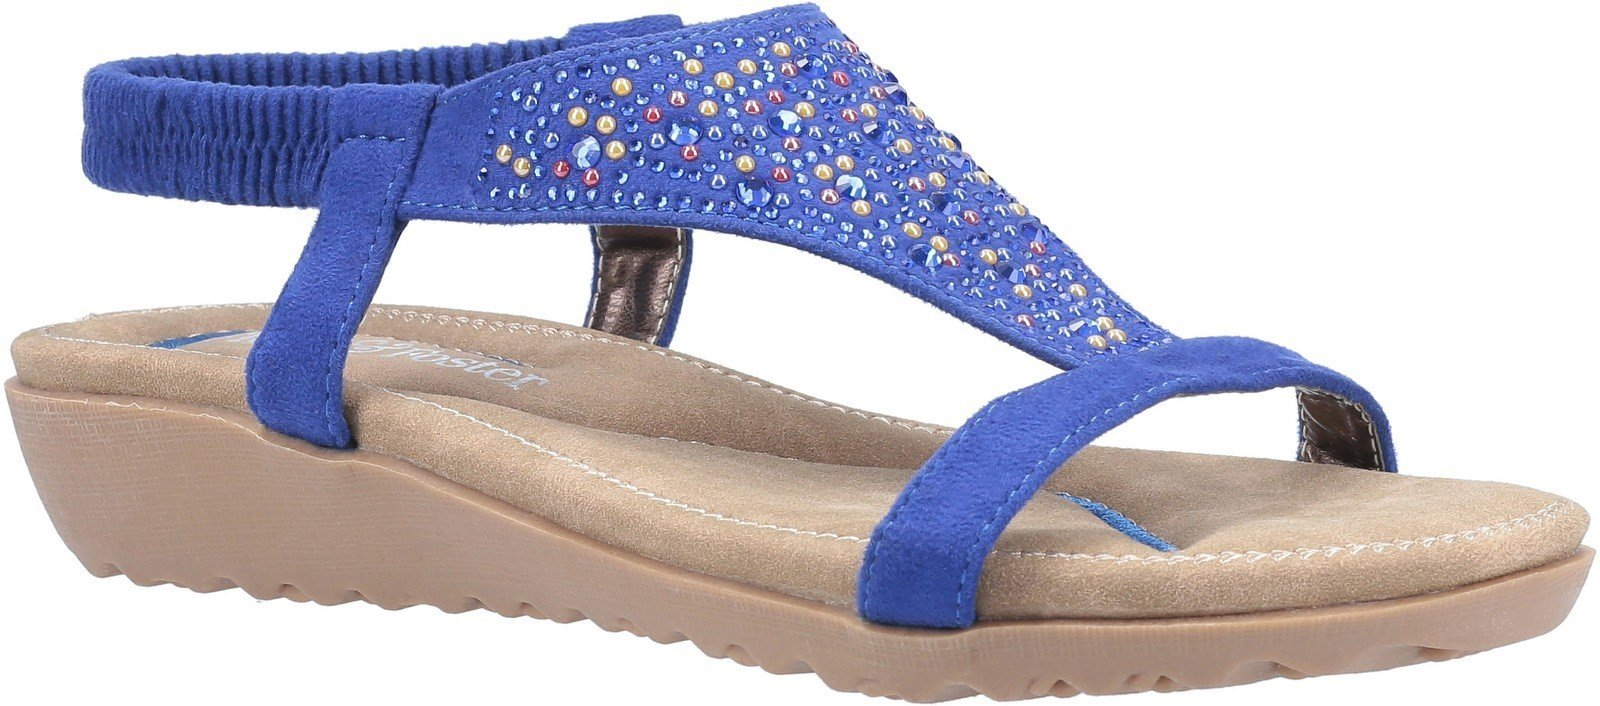 Fleet & Foster Women's Nicosia Slingback Sandal Various Colours 23732 - Blue 5